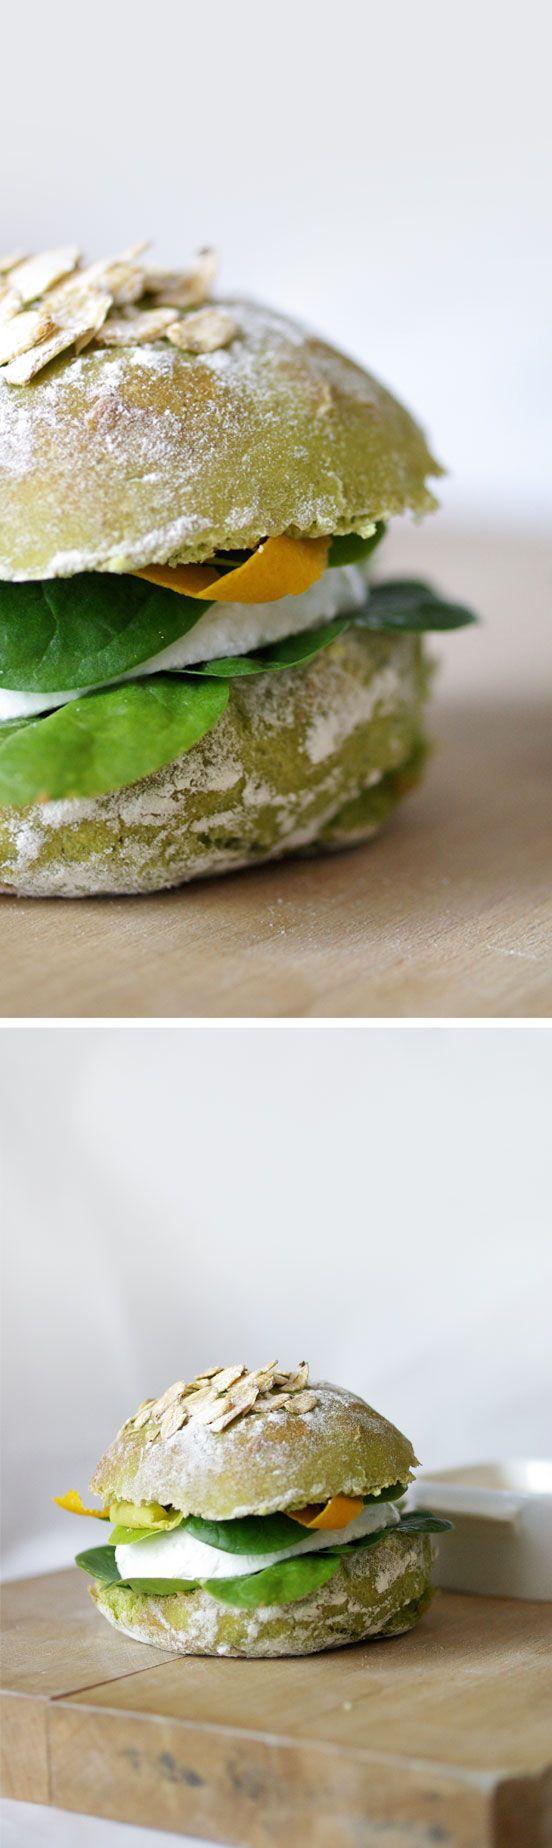 Burger sweet salade et fromage frais|Petits Pois